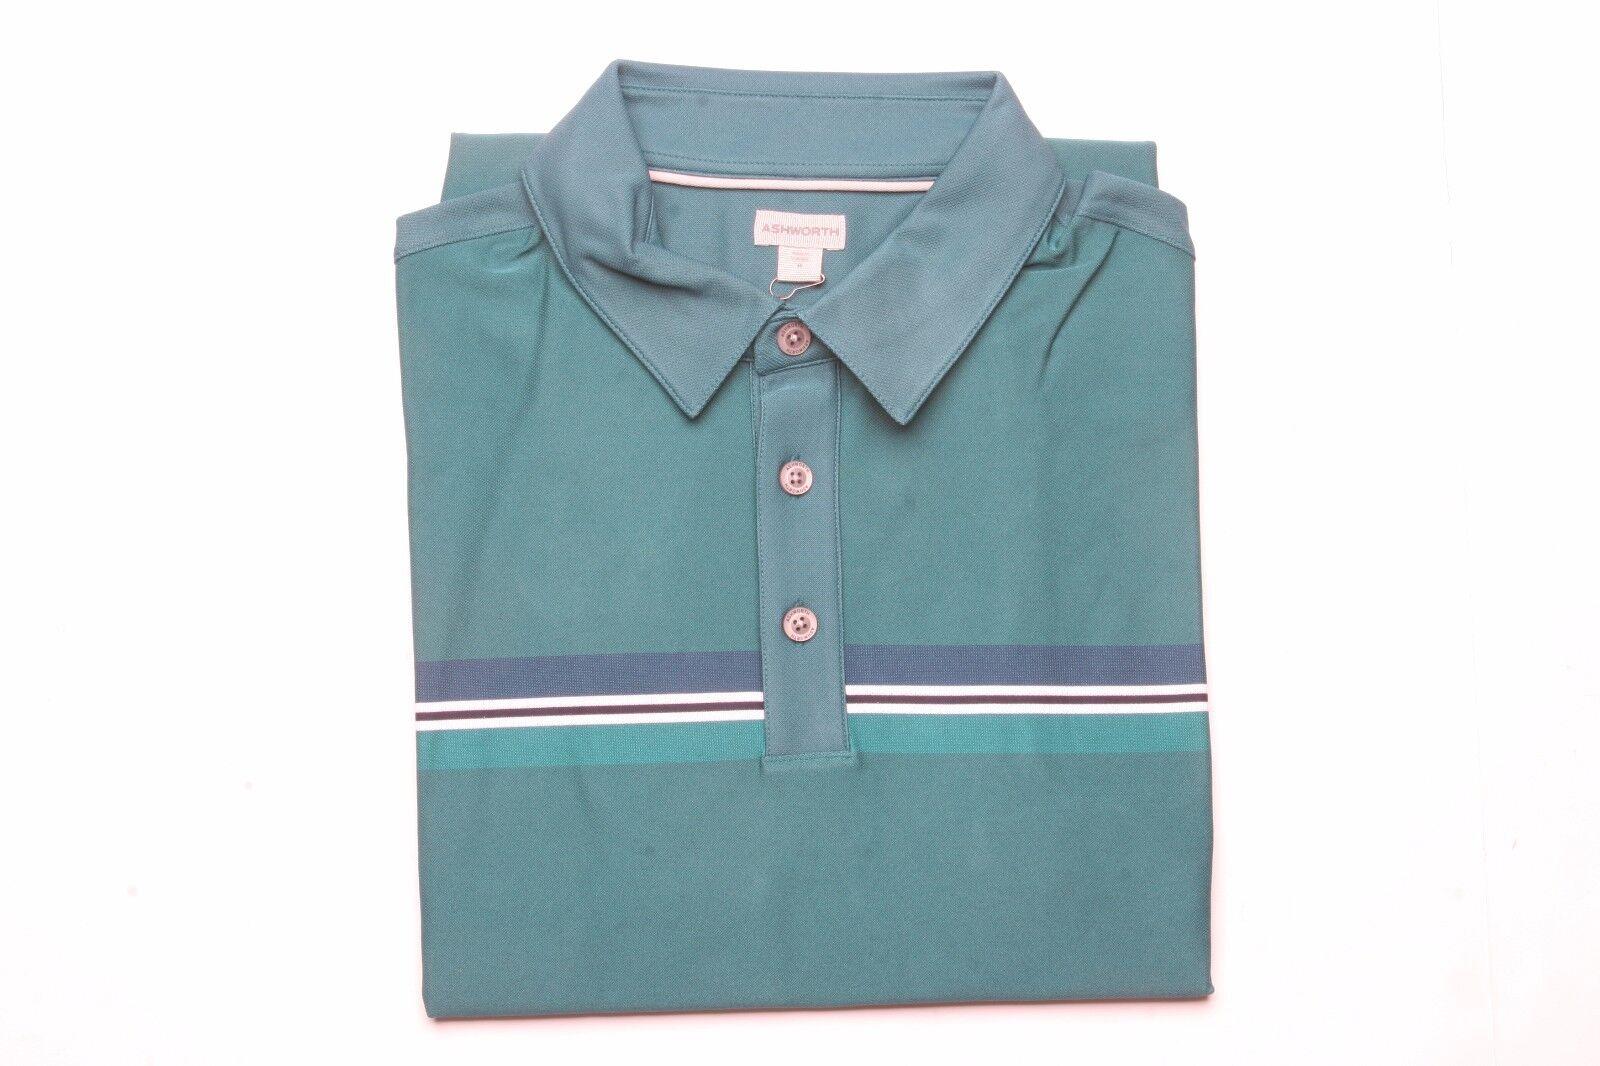 Ashworth Striped Short Sleeve Polo Shirt (M) AE9526 Mariner